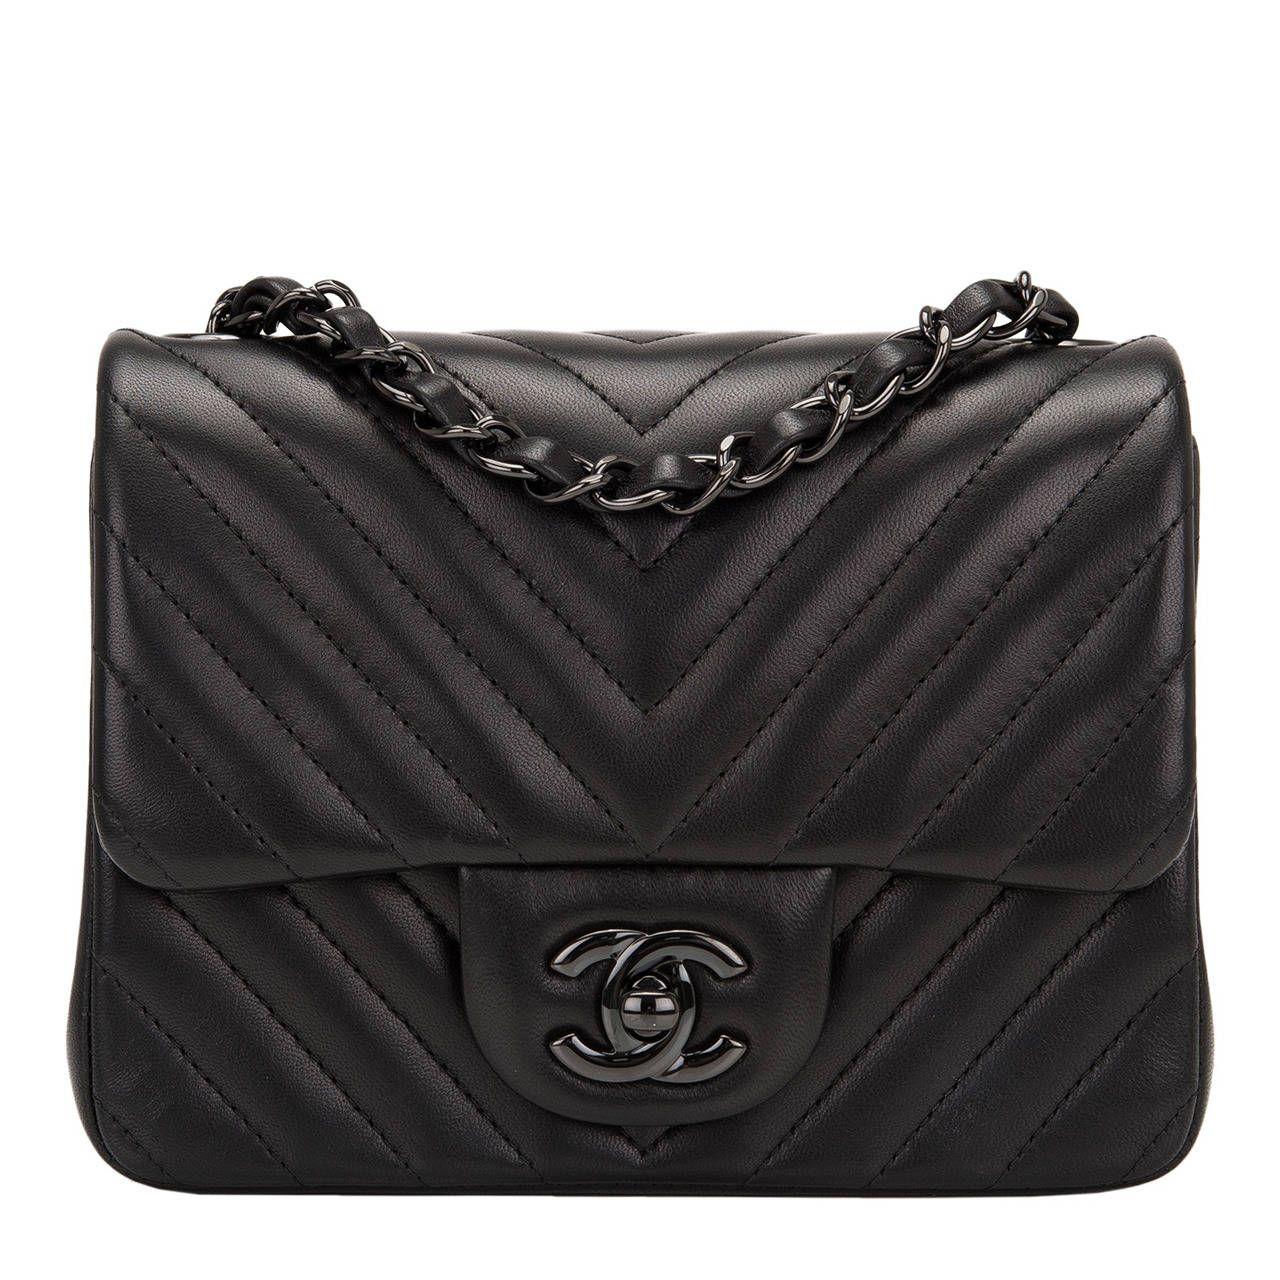 dff84f0e9d9917 Chanel So Black Chevron Mini Flap Bag | Shoes, bags, accessories ...